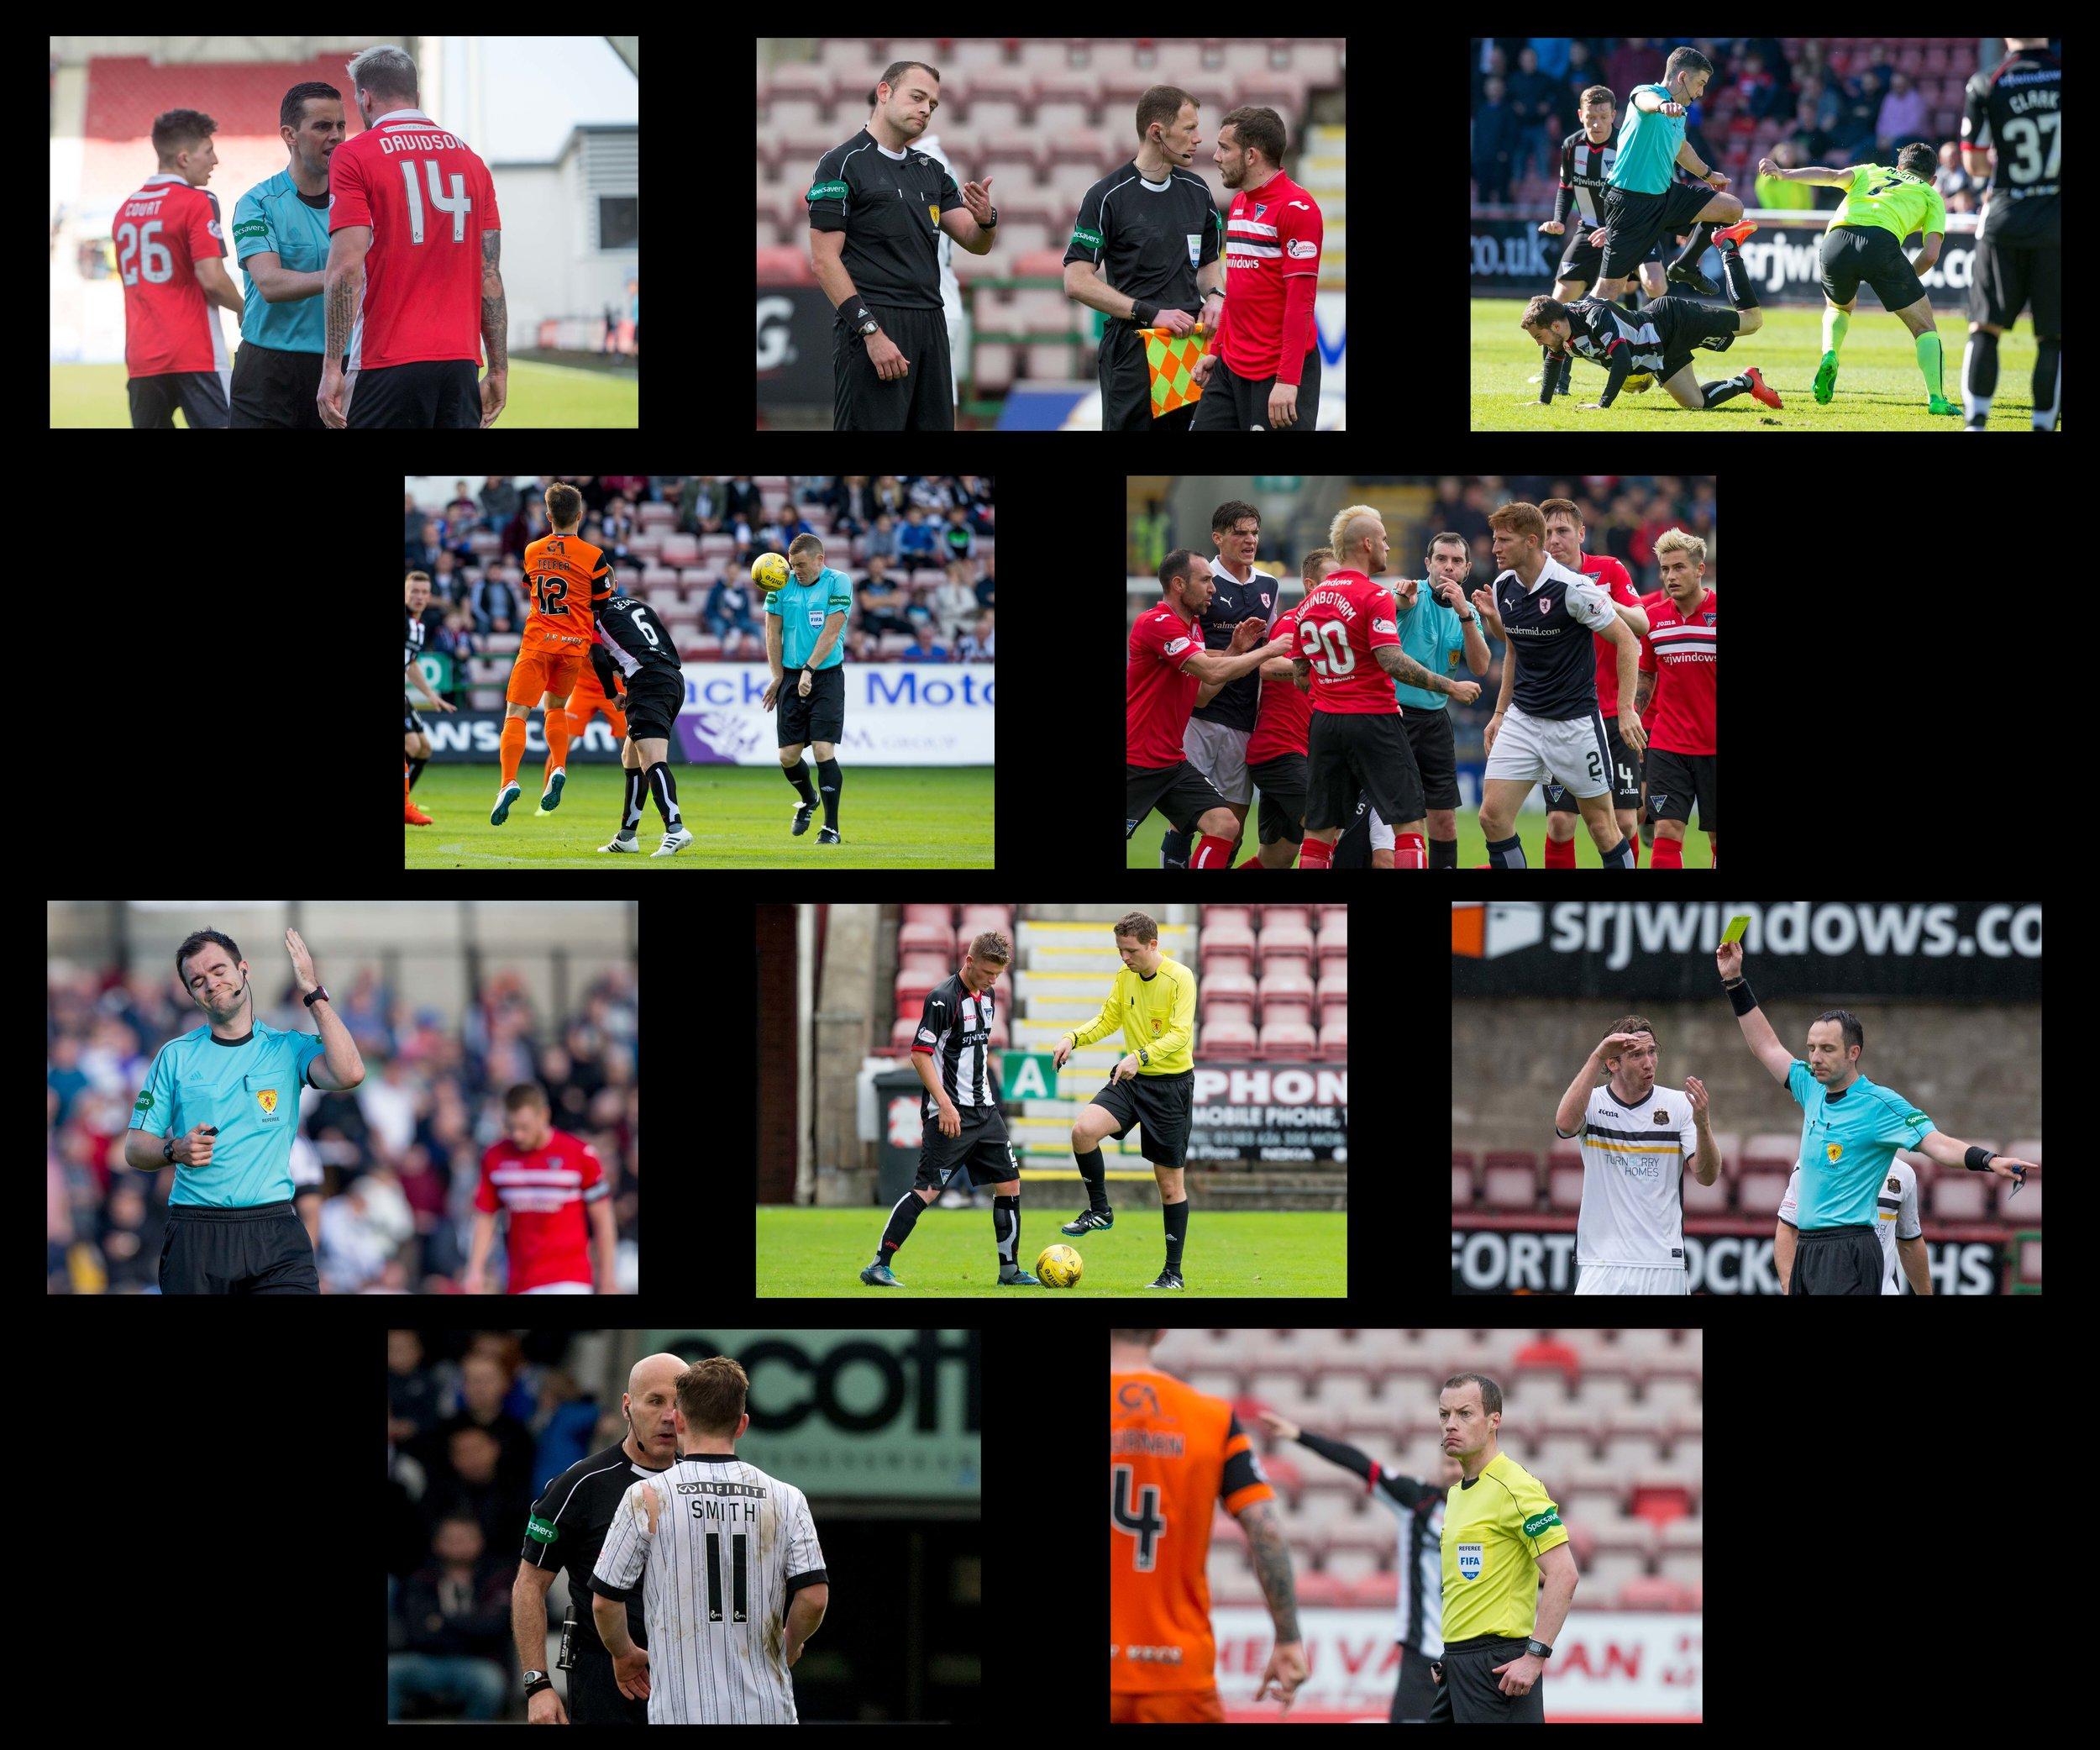 SPPA2017_Reportage_Focus on Referees.jpg